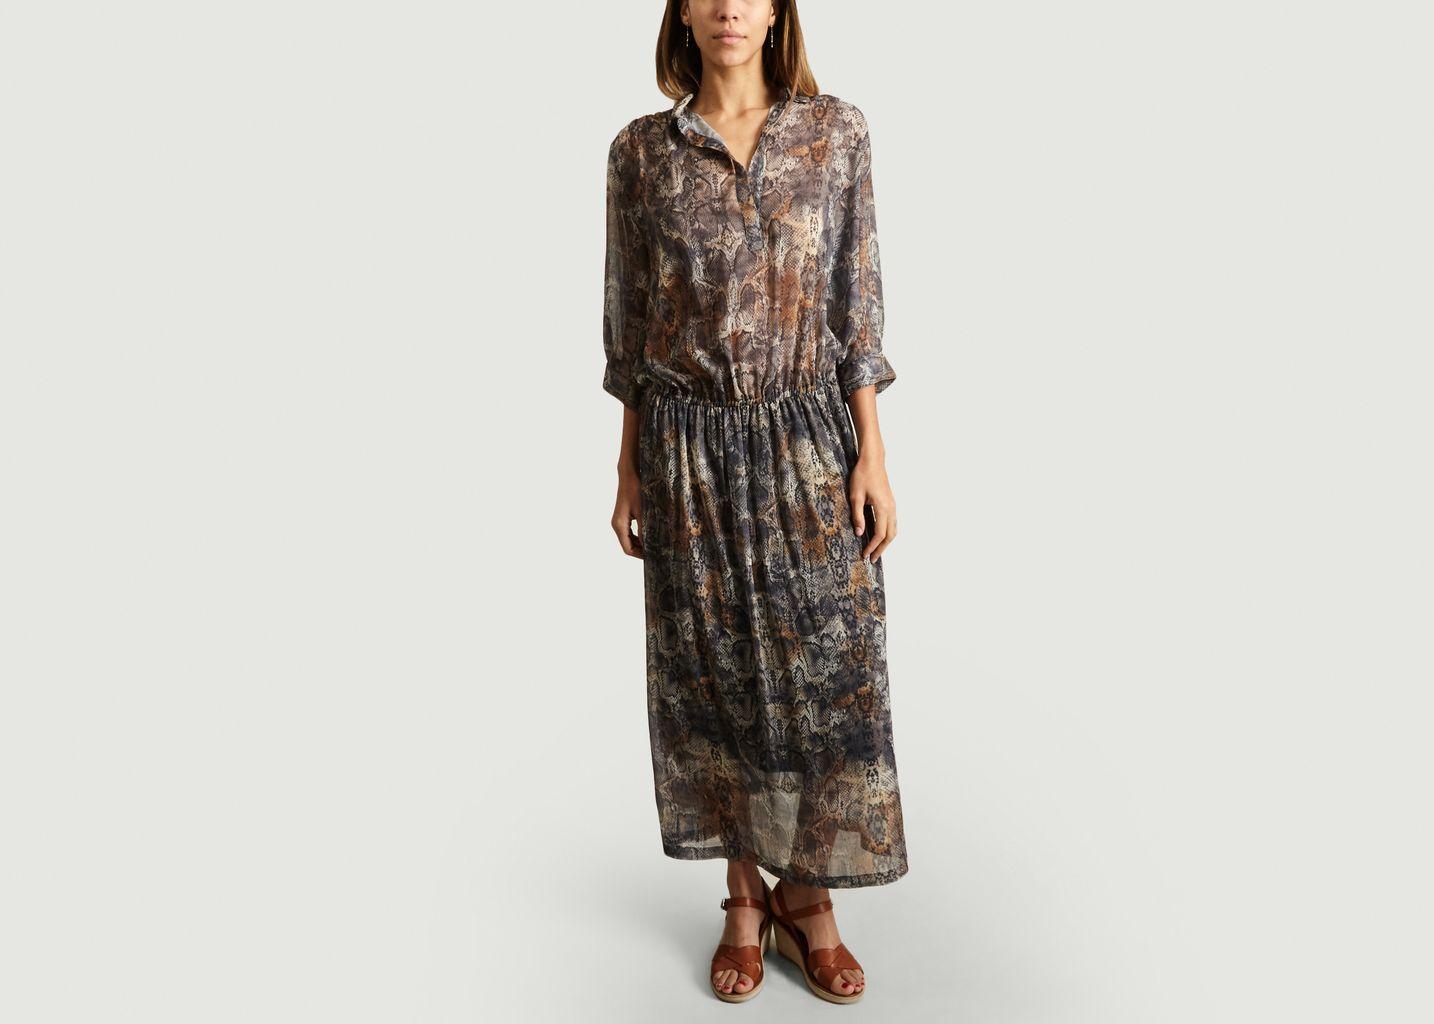 Robe Print Serpent Salma - Maison Olga